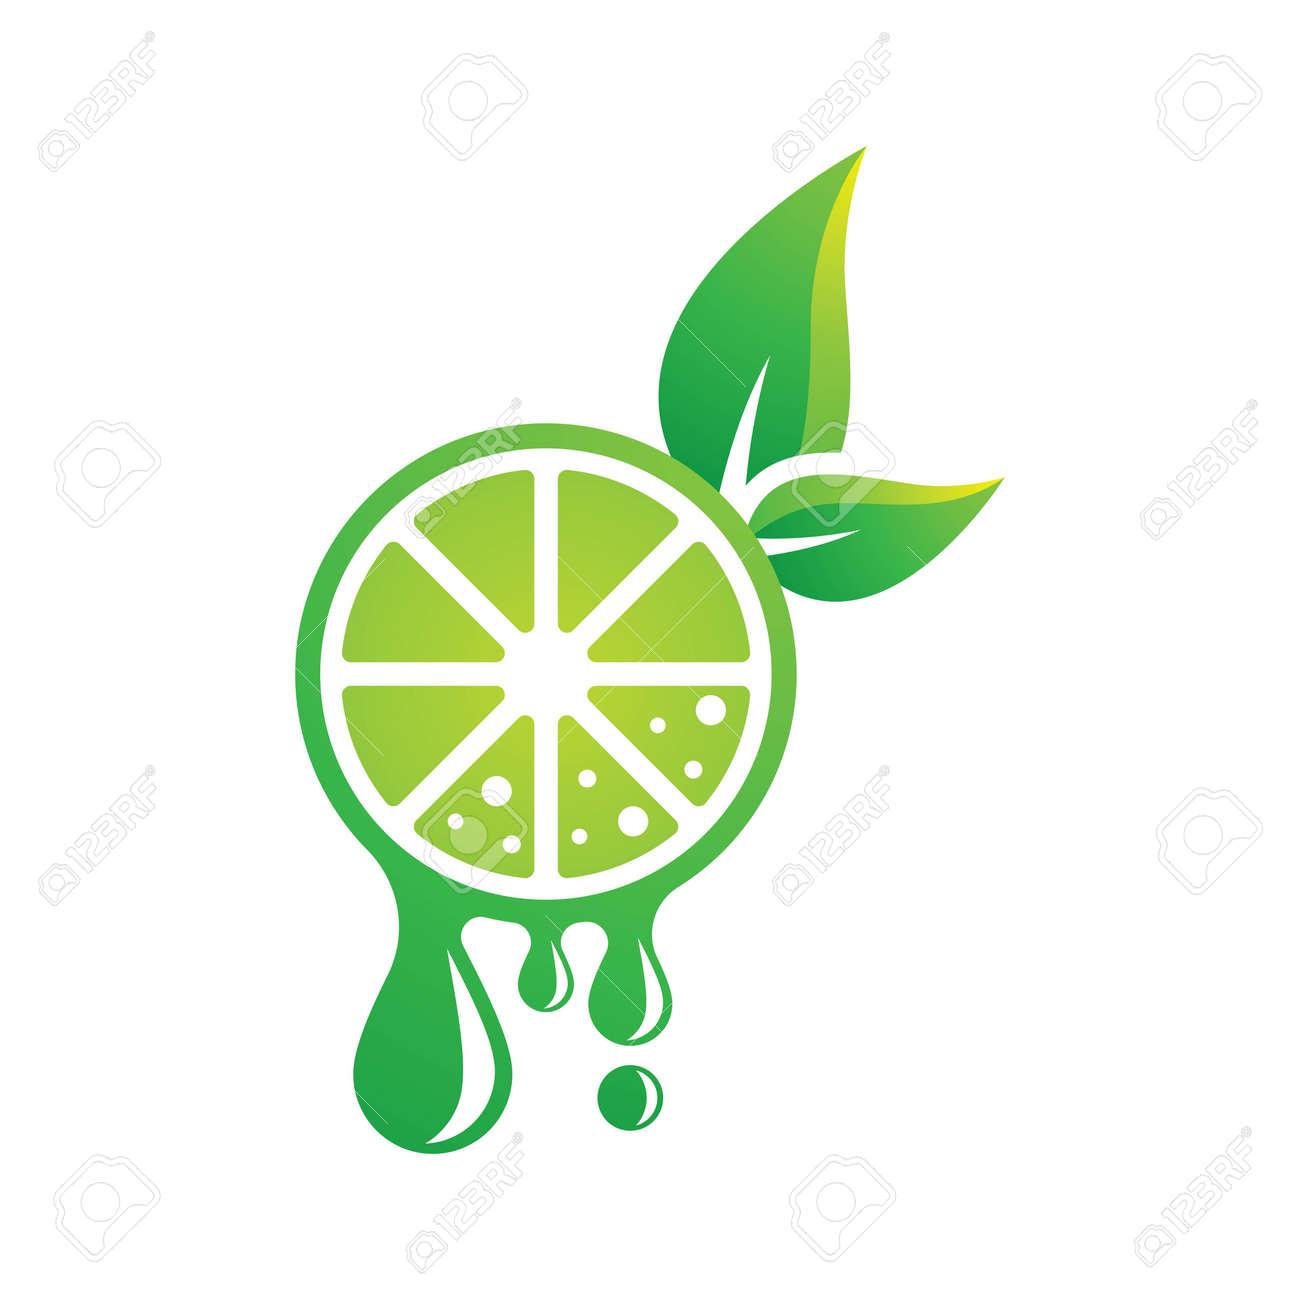 Lemon logo images illustration design - 173410510